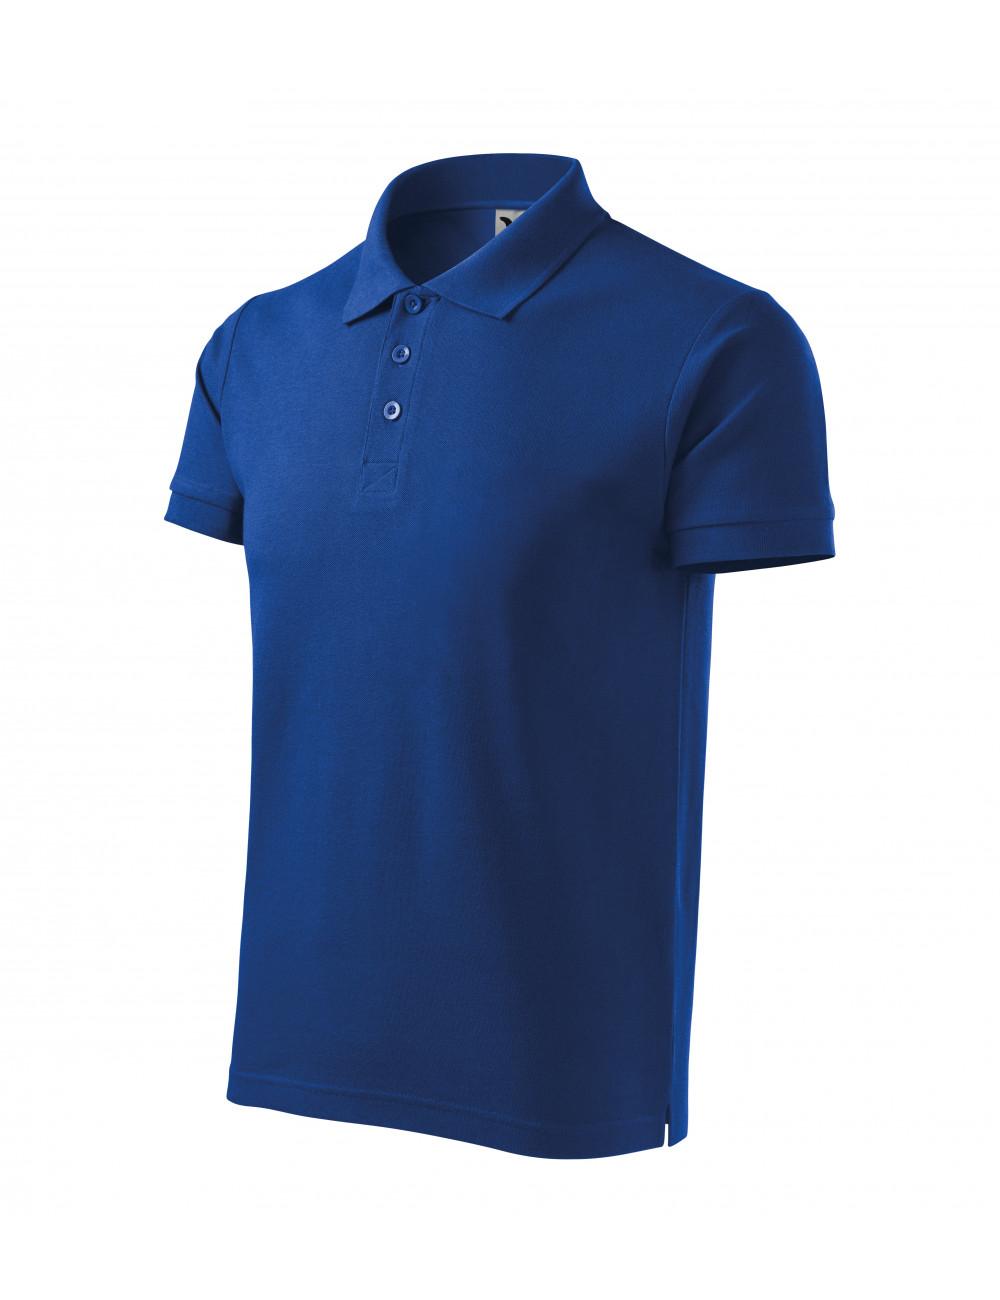 Adler MALFINI Koszulka polo męska Cotton Heavy 215 chabrowy